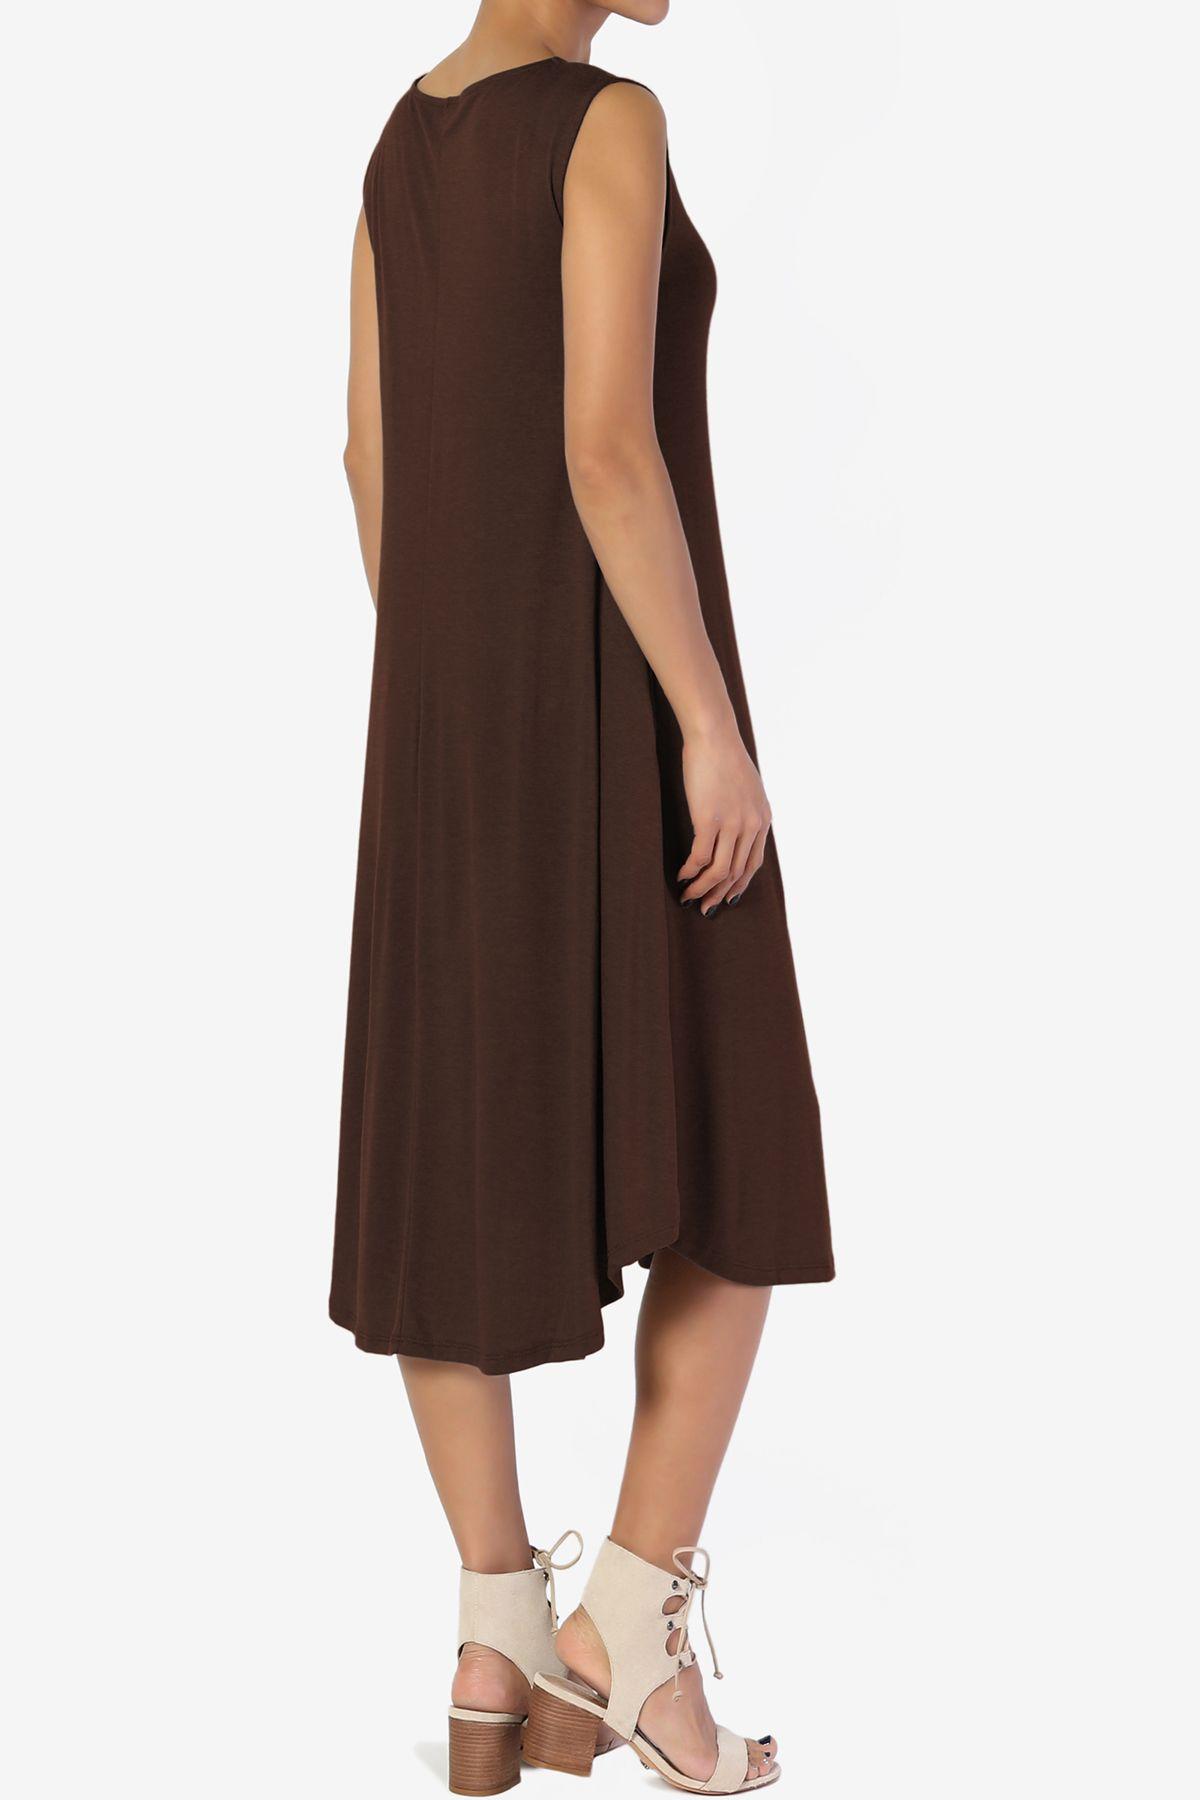 Themogan Themogan Women S S 3x Sleeveless Fit Flare A Line Draped Jersey Midi Long Dress Walmart Com Long Midi Dress Dresses Long Dress [ 1800 x 1200 Pixel ]